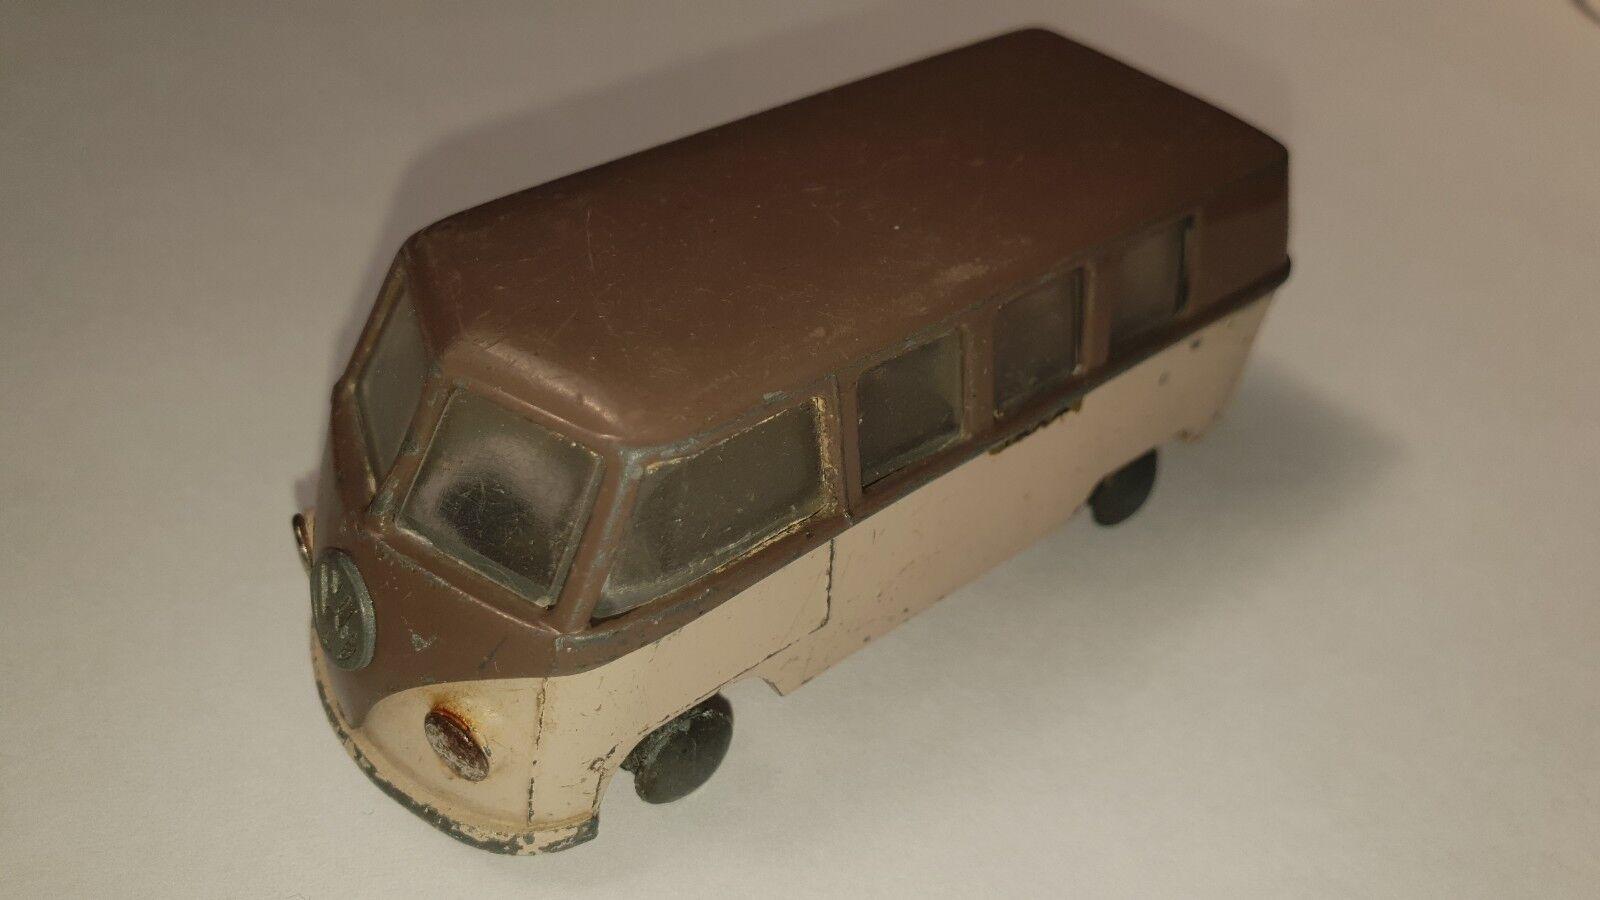 Vintage TEKNO Denmark 410 VW Bus typ T1 TAXI Reklamebiler 1953 -60 without tires